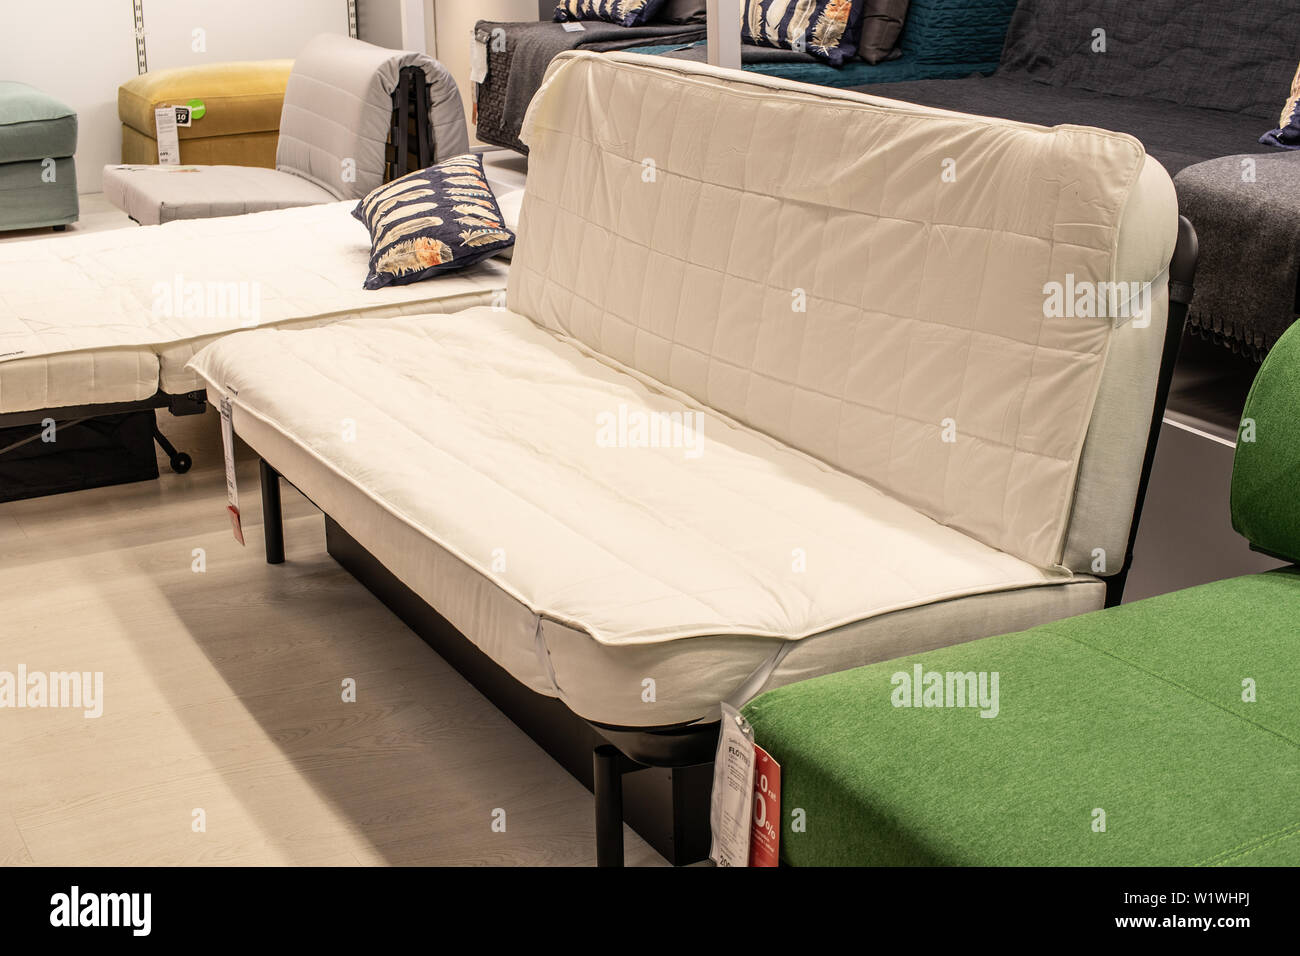 Divano Velluto Blu Ikea divani moderni immagini & divani moderni fotos stock - alamy